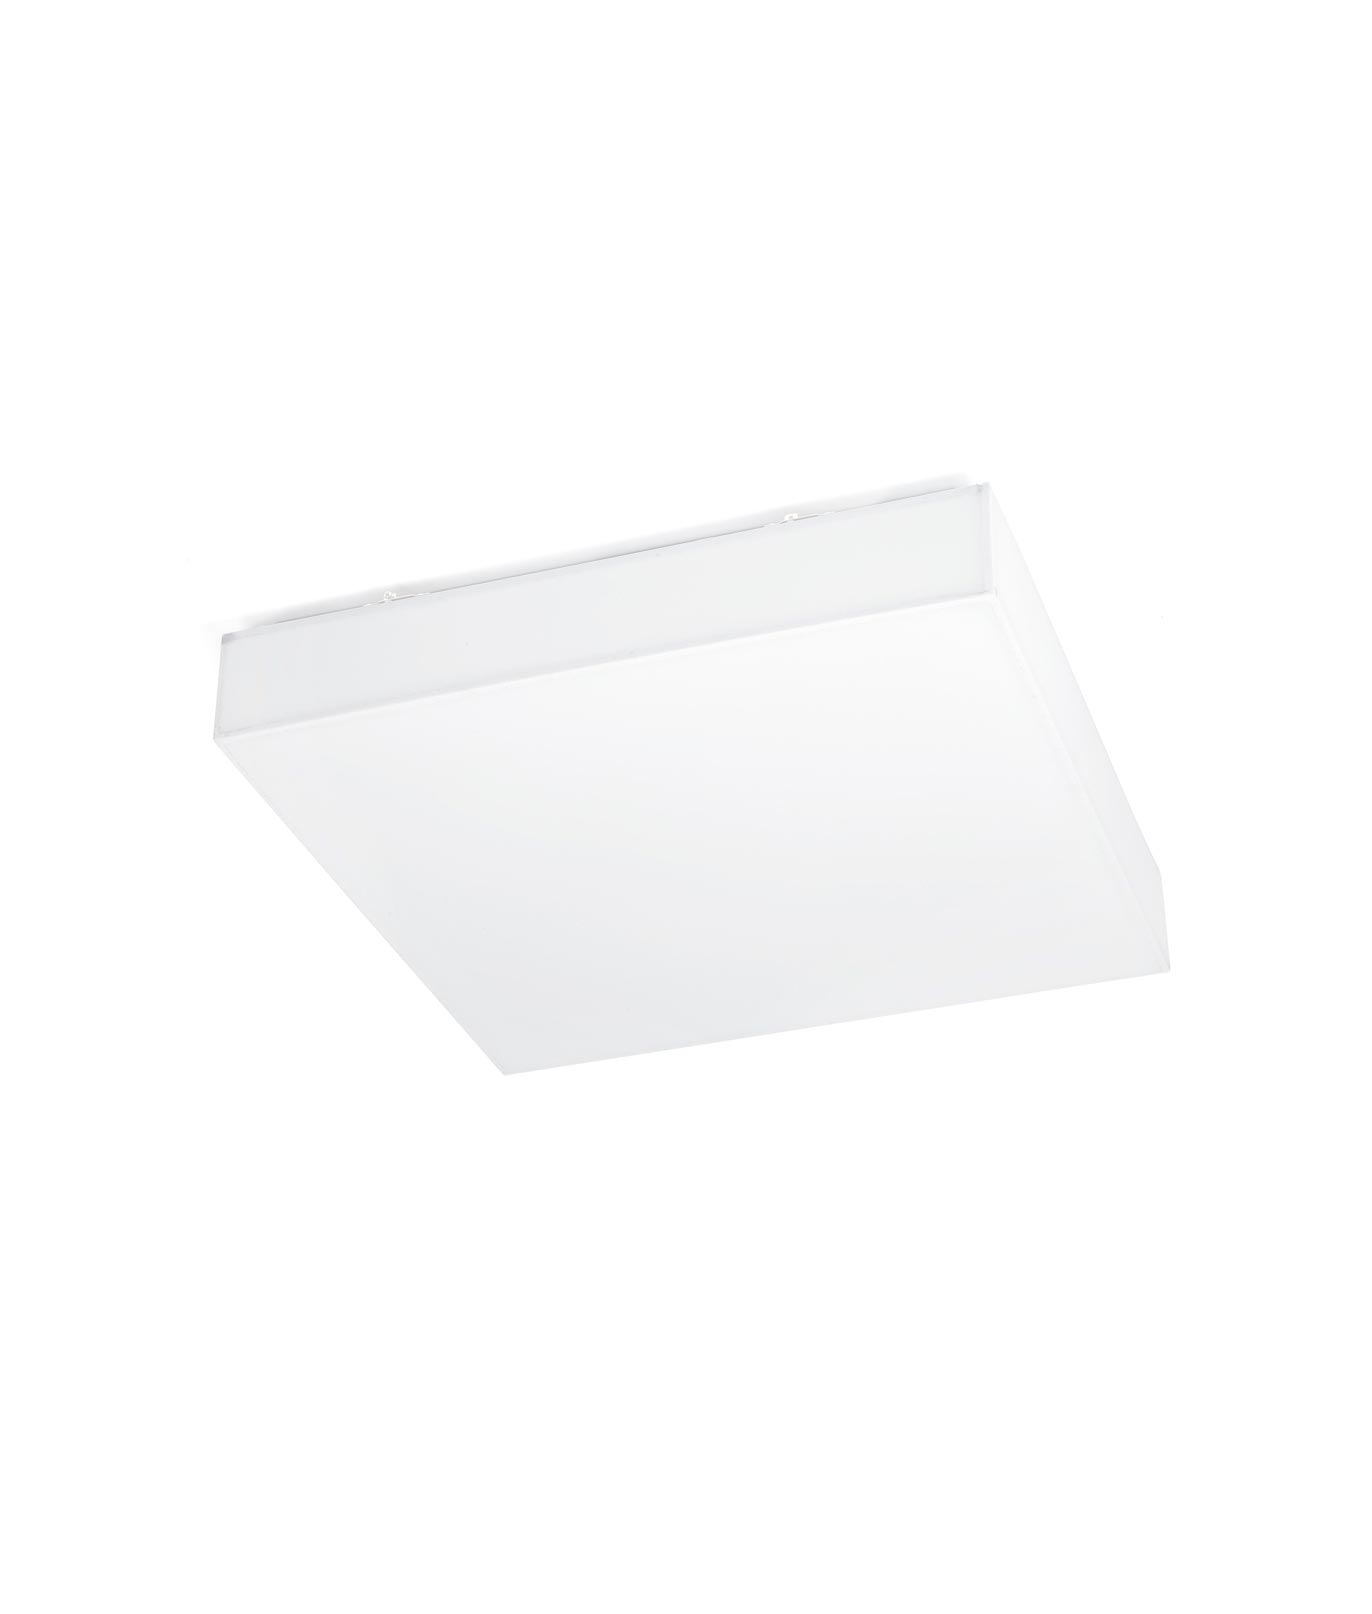 Plafón cuadrado blanco SILK-4 LED